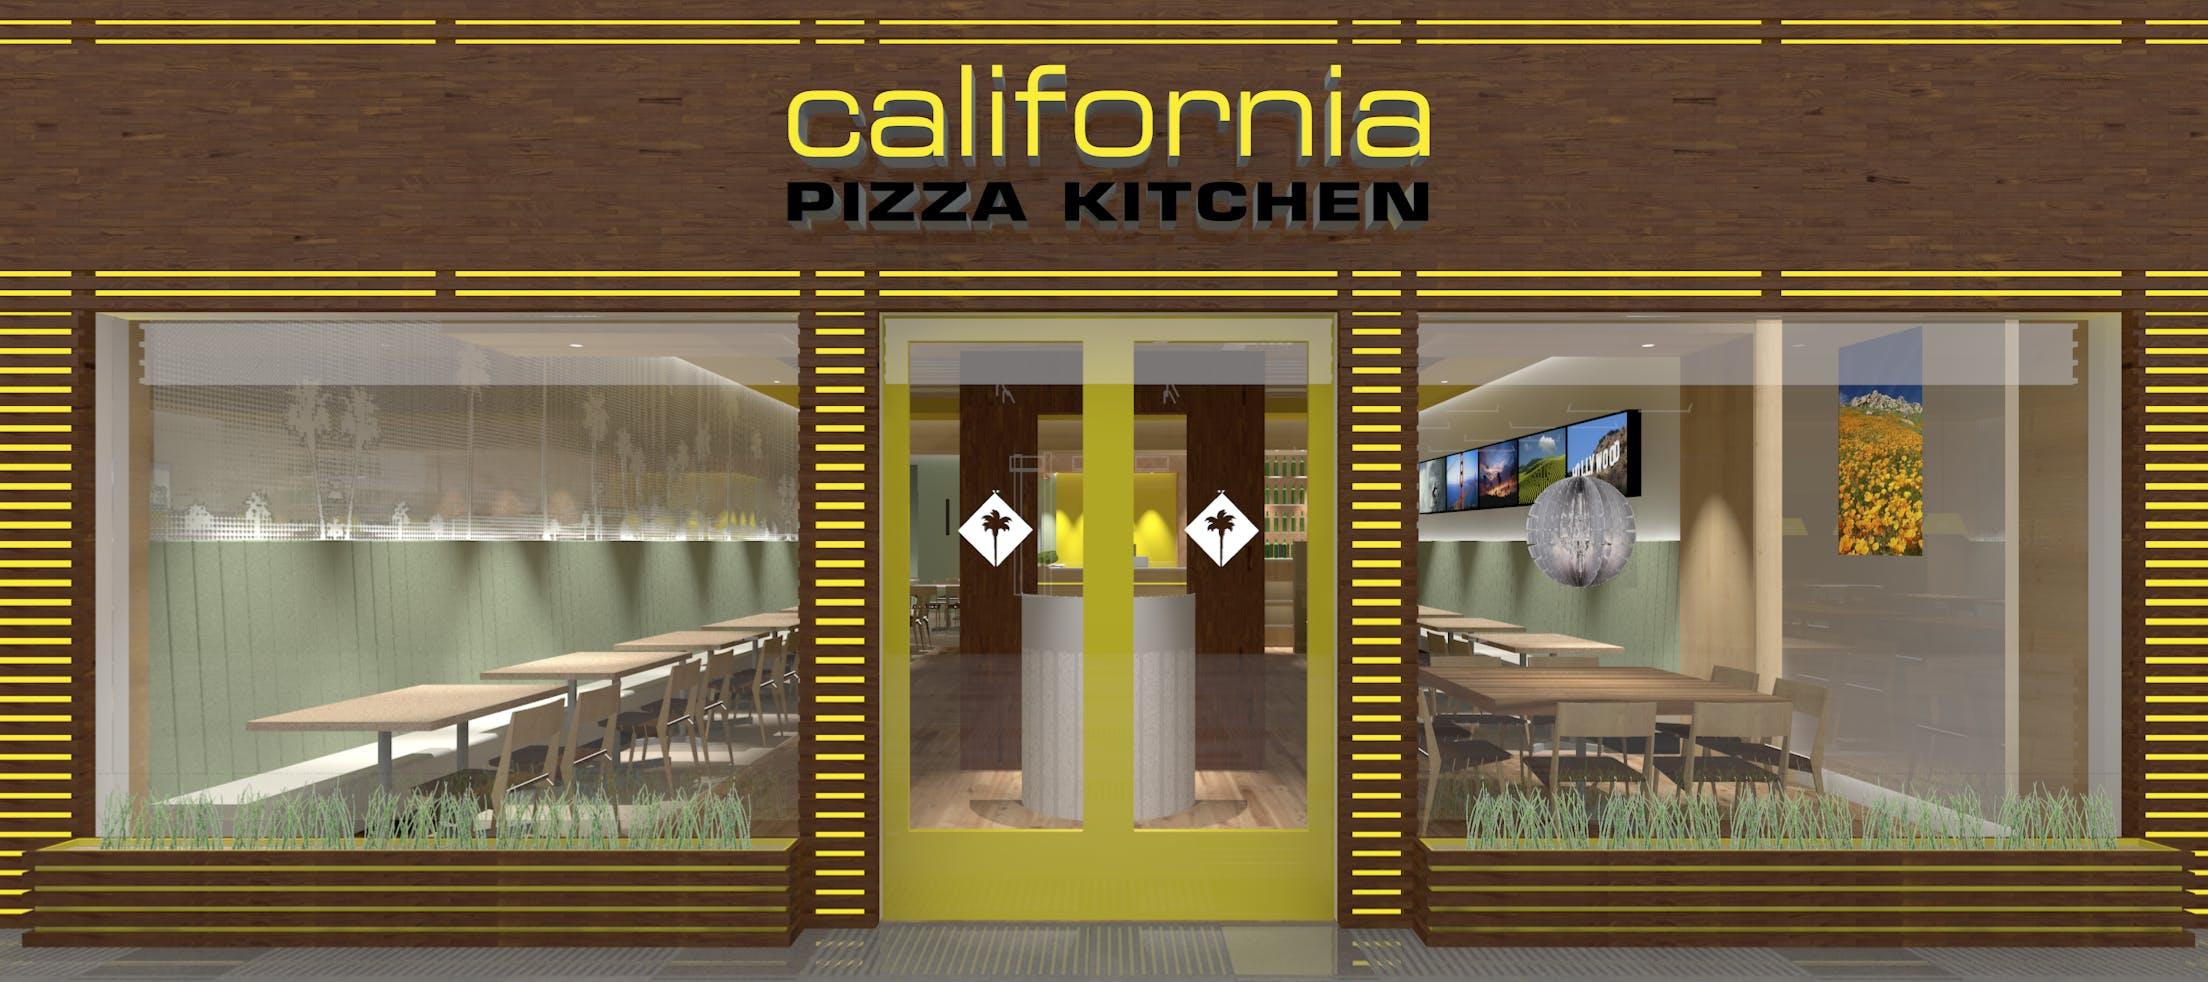 California Pizza Kitchen Palm Tree California Pizza Kitchen  Schism Design Architecture & Interiors